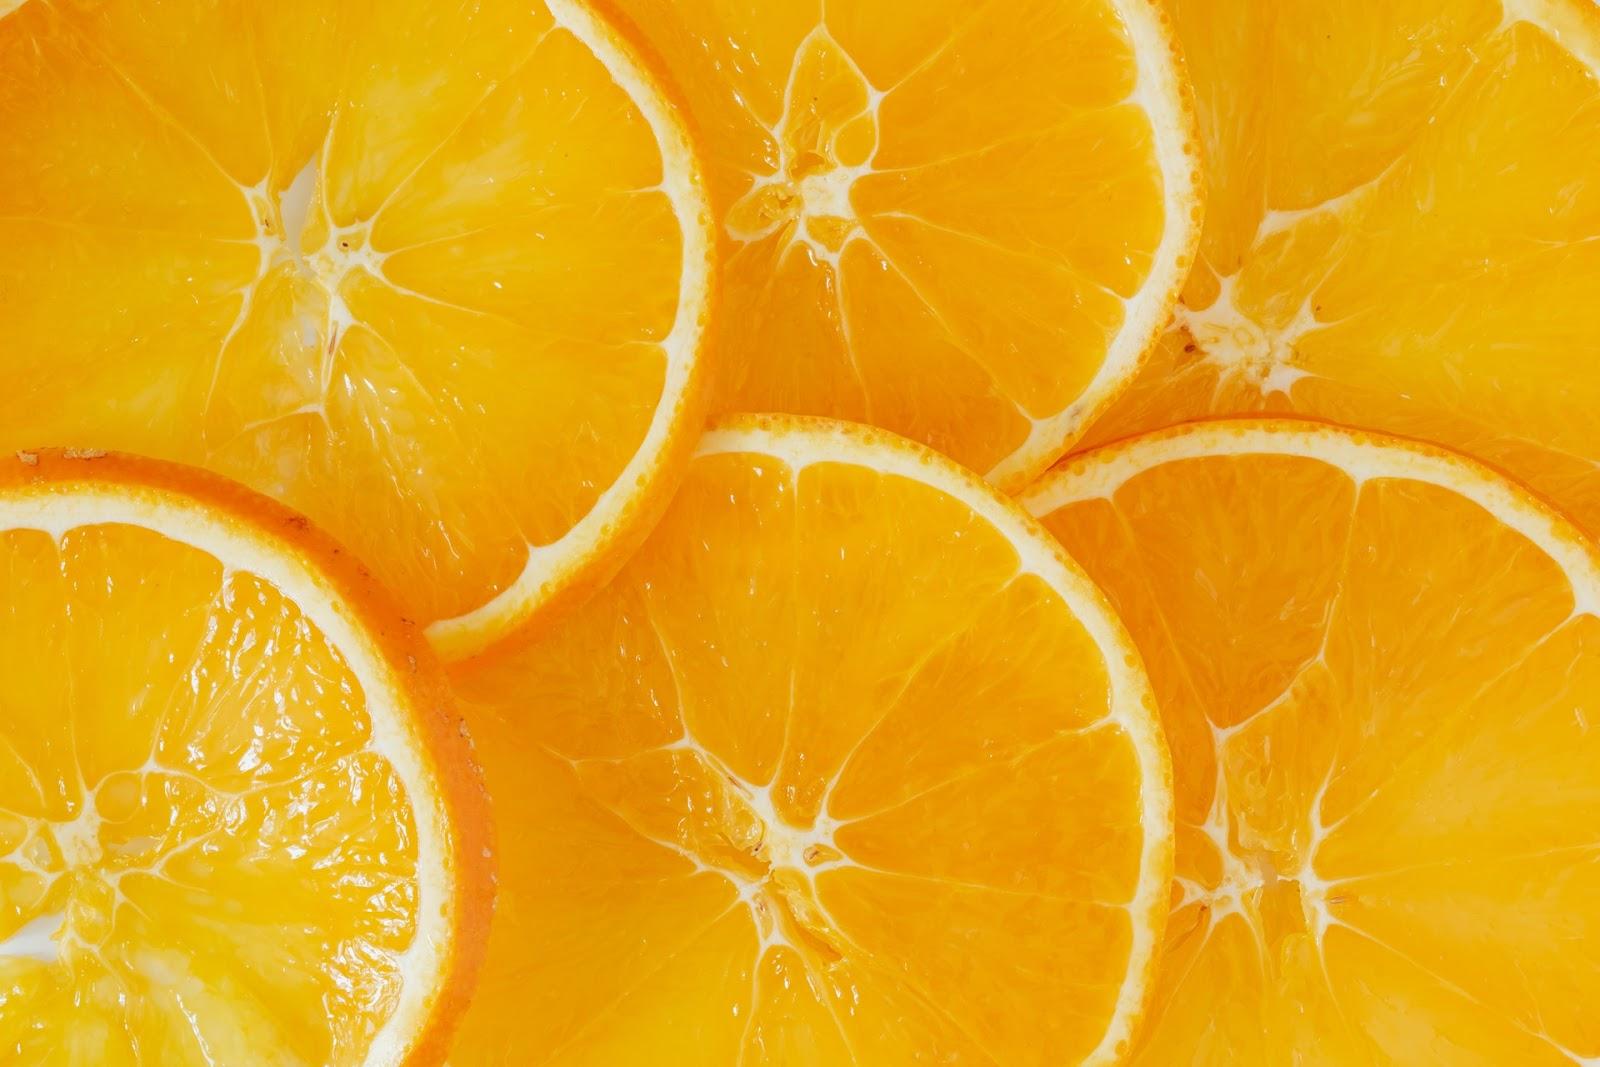 Slices of orange laid on a table.